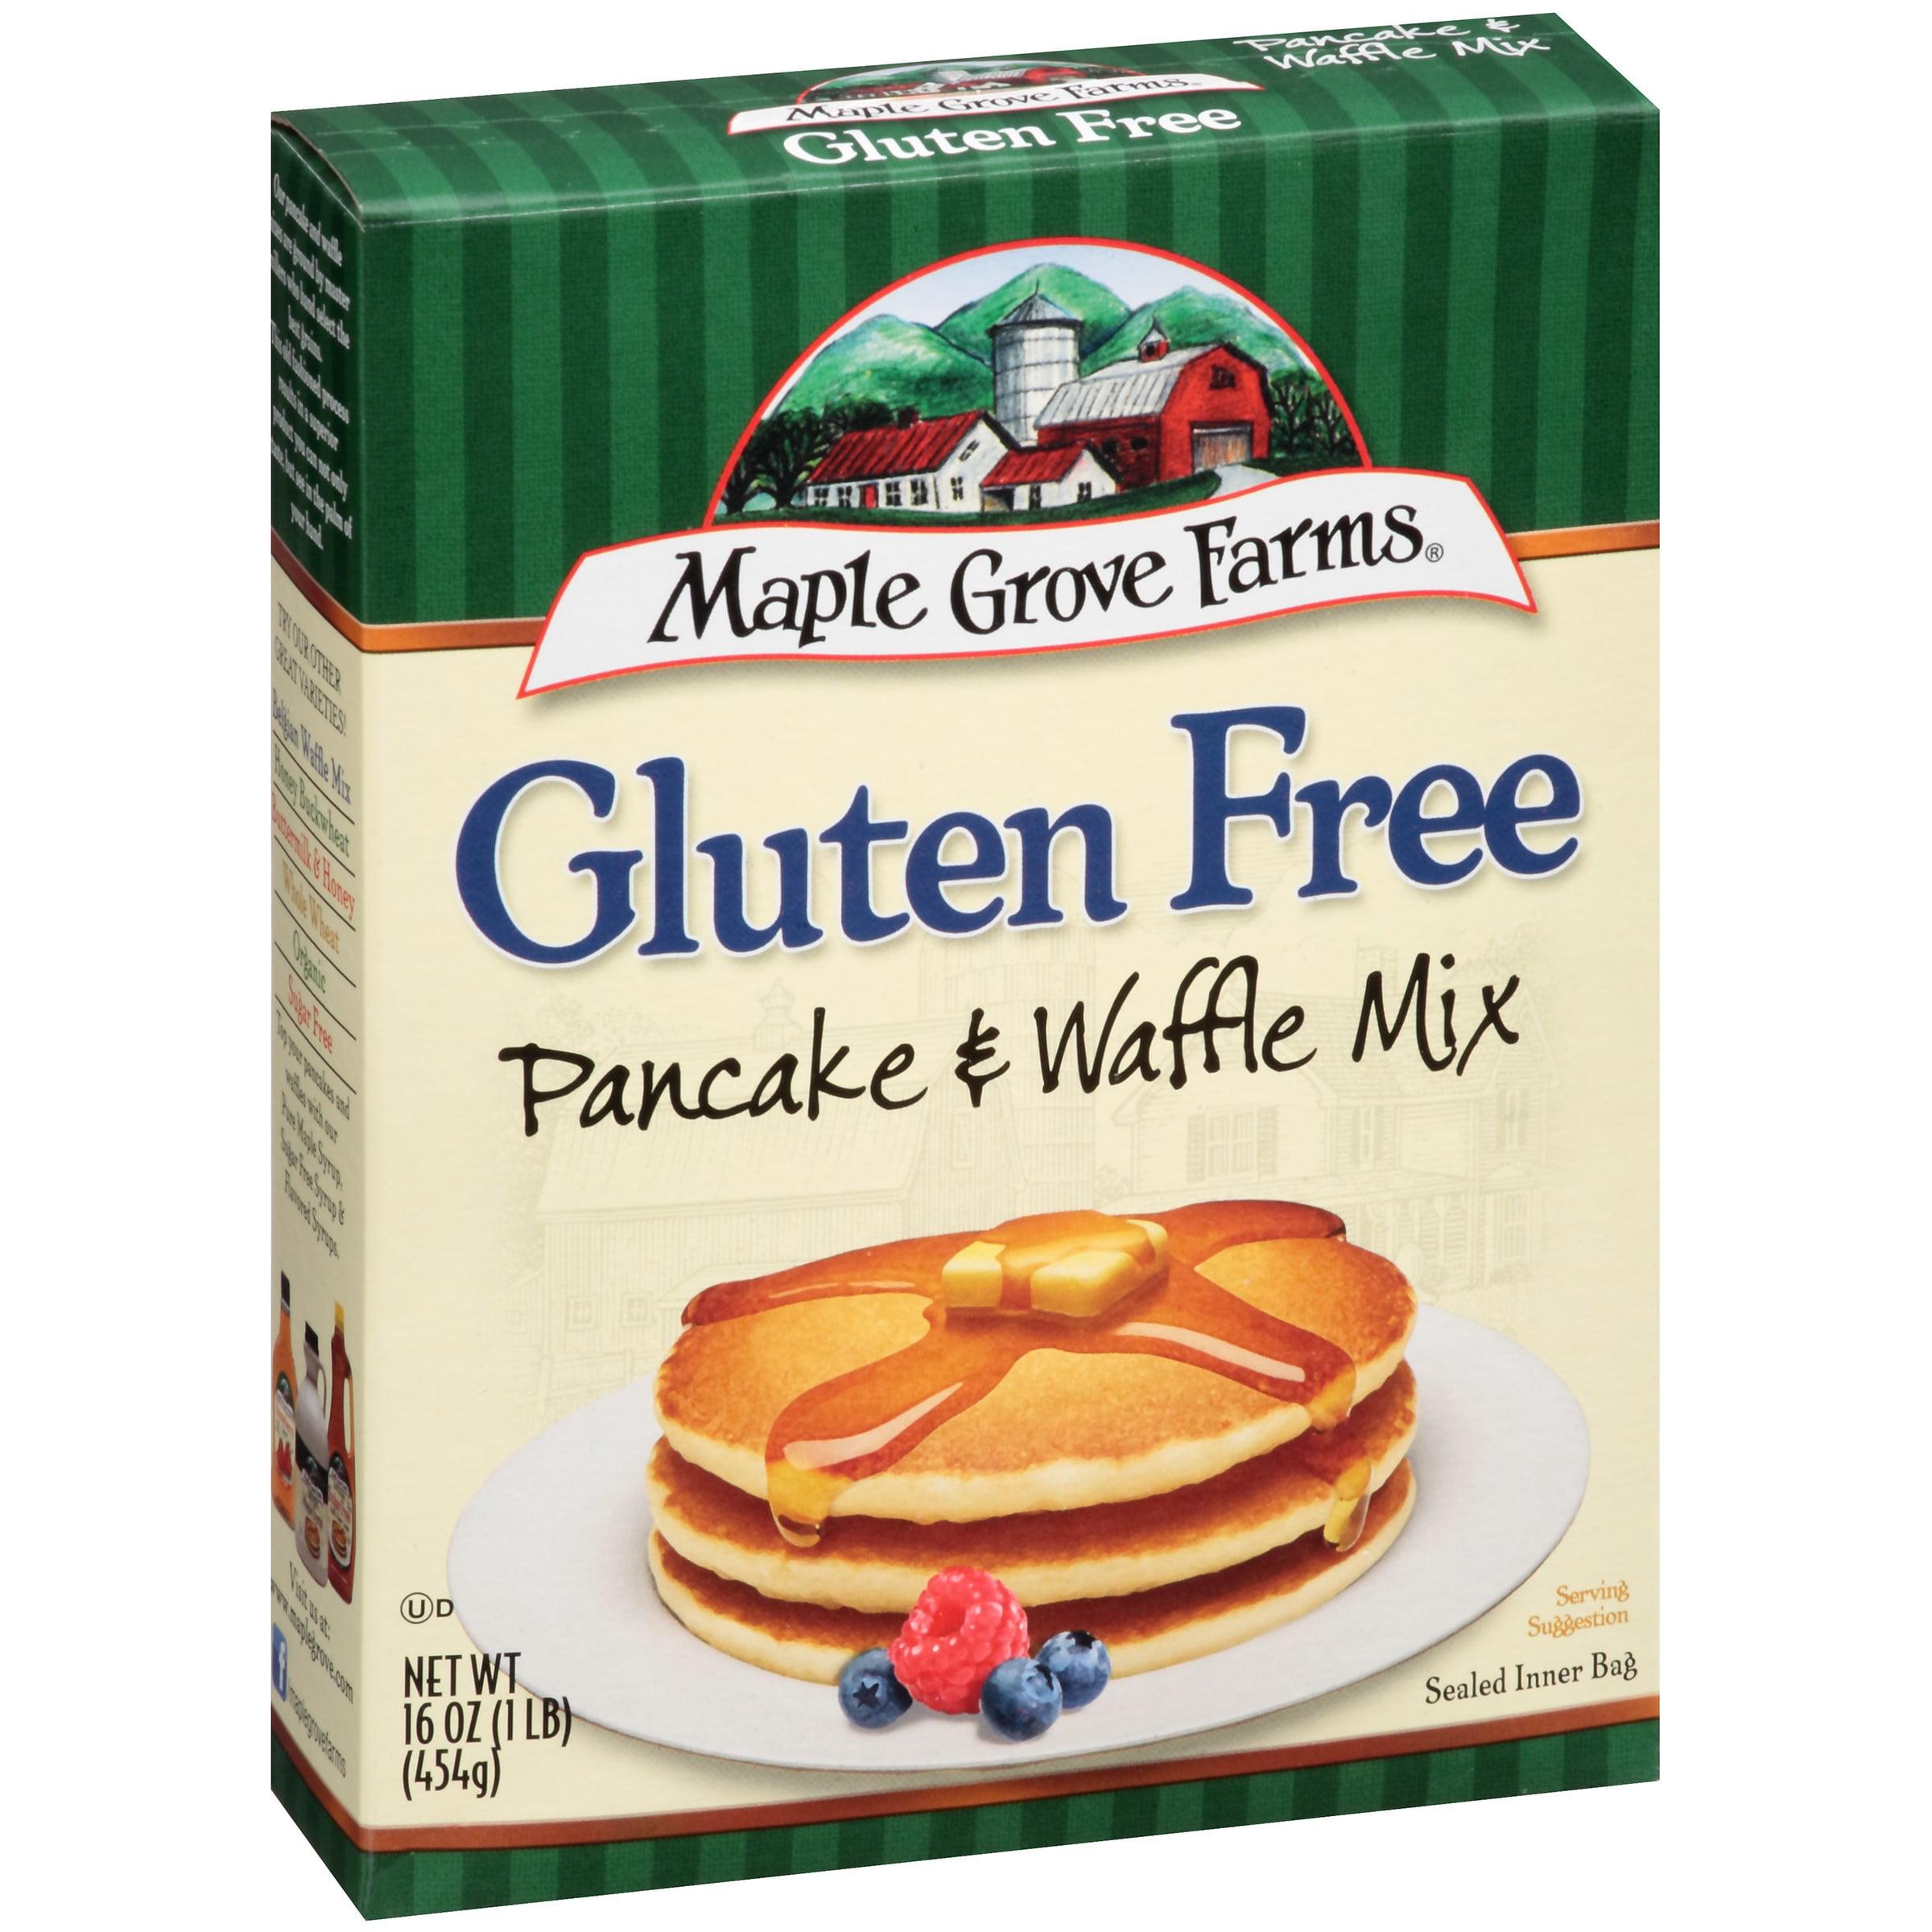 Maple Grove Farms Gluten Free Pancake & Waffle Mix 16 oz. Box by B&G